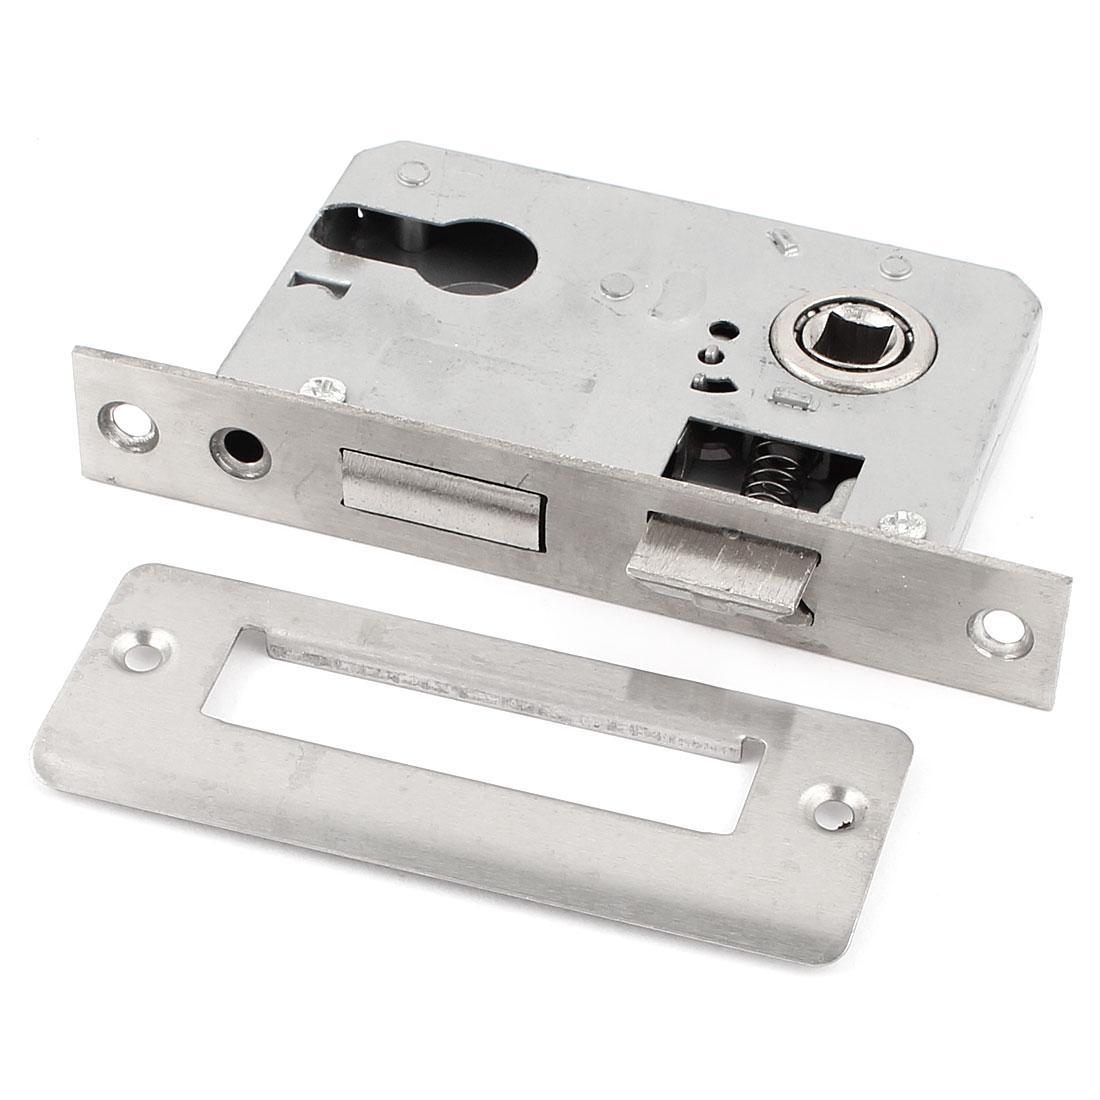 Office Home Security Metal Door Locking Gate Latch Lock Silver Tone